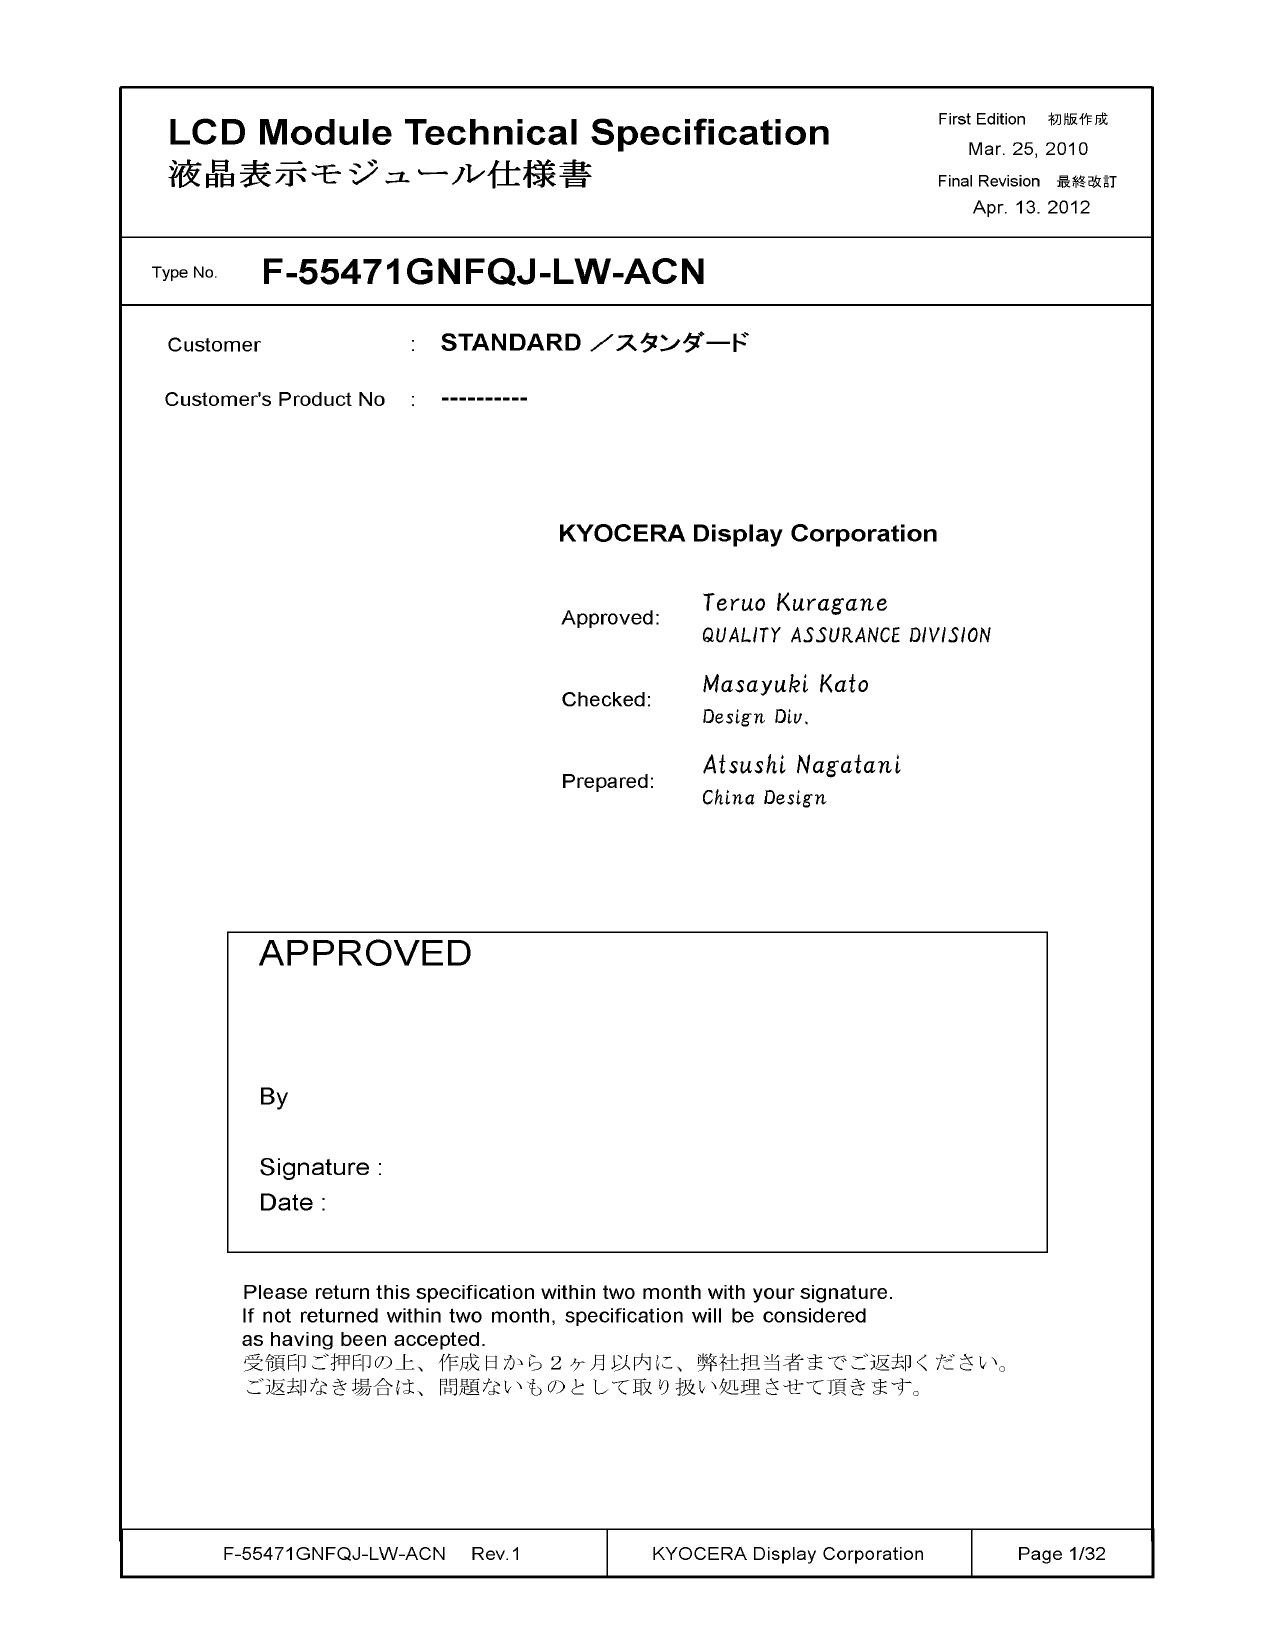 F-55471GNFQJ-LW-ACN دیتاشیت PDF